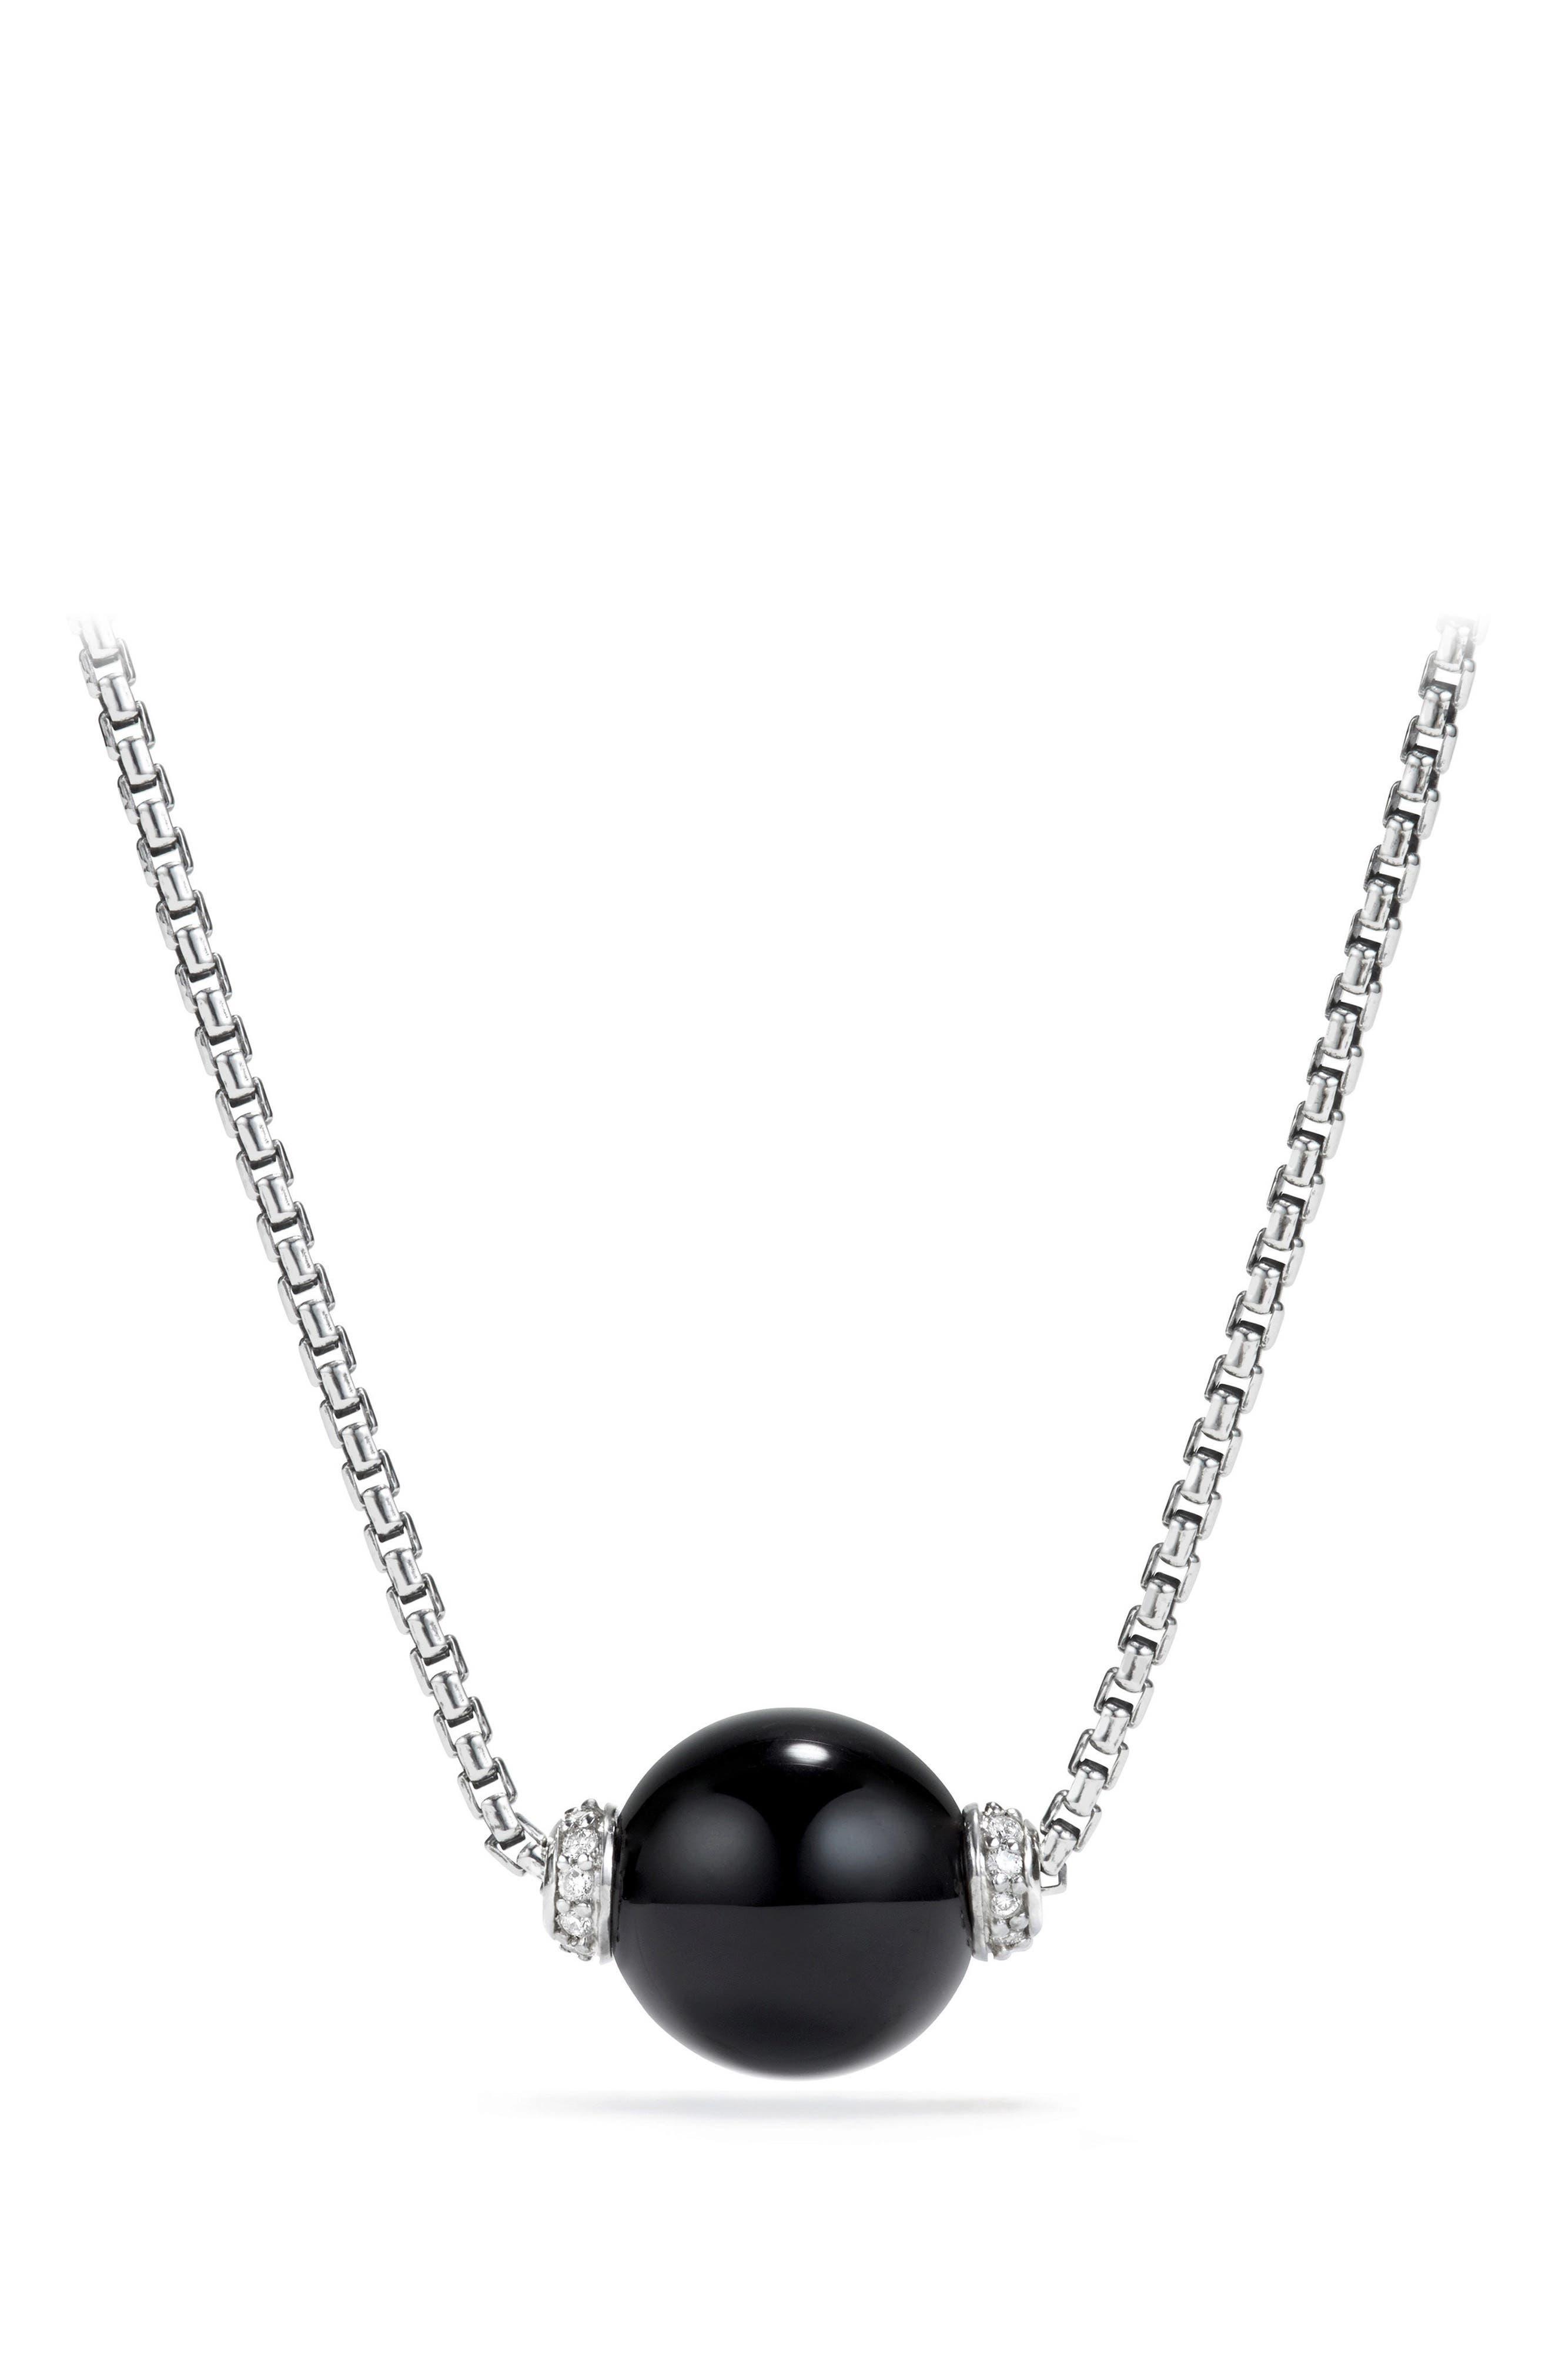 Solari Pendant Necklace with Diamonds,                             Main thumbnail 1, color,                             SILVER/ DIAMOND/ BLACK ONYX